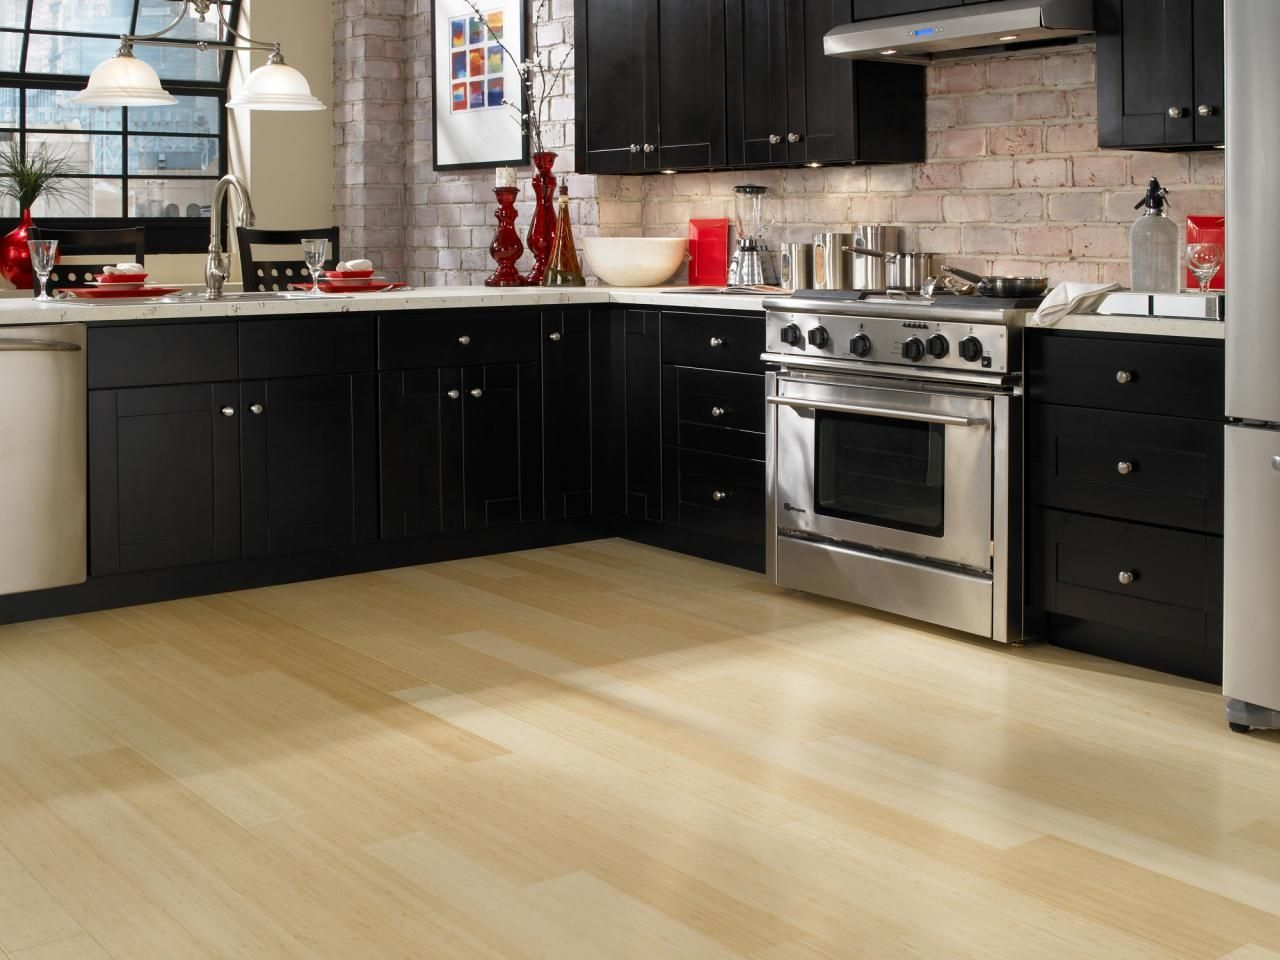 Light Colored Kitchen Floors  Httpsinhvienthienan Entrancing Kitchen Floor Options Decorating Design